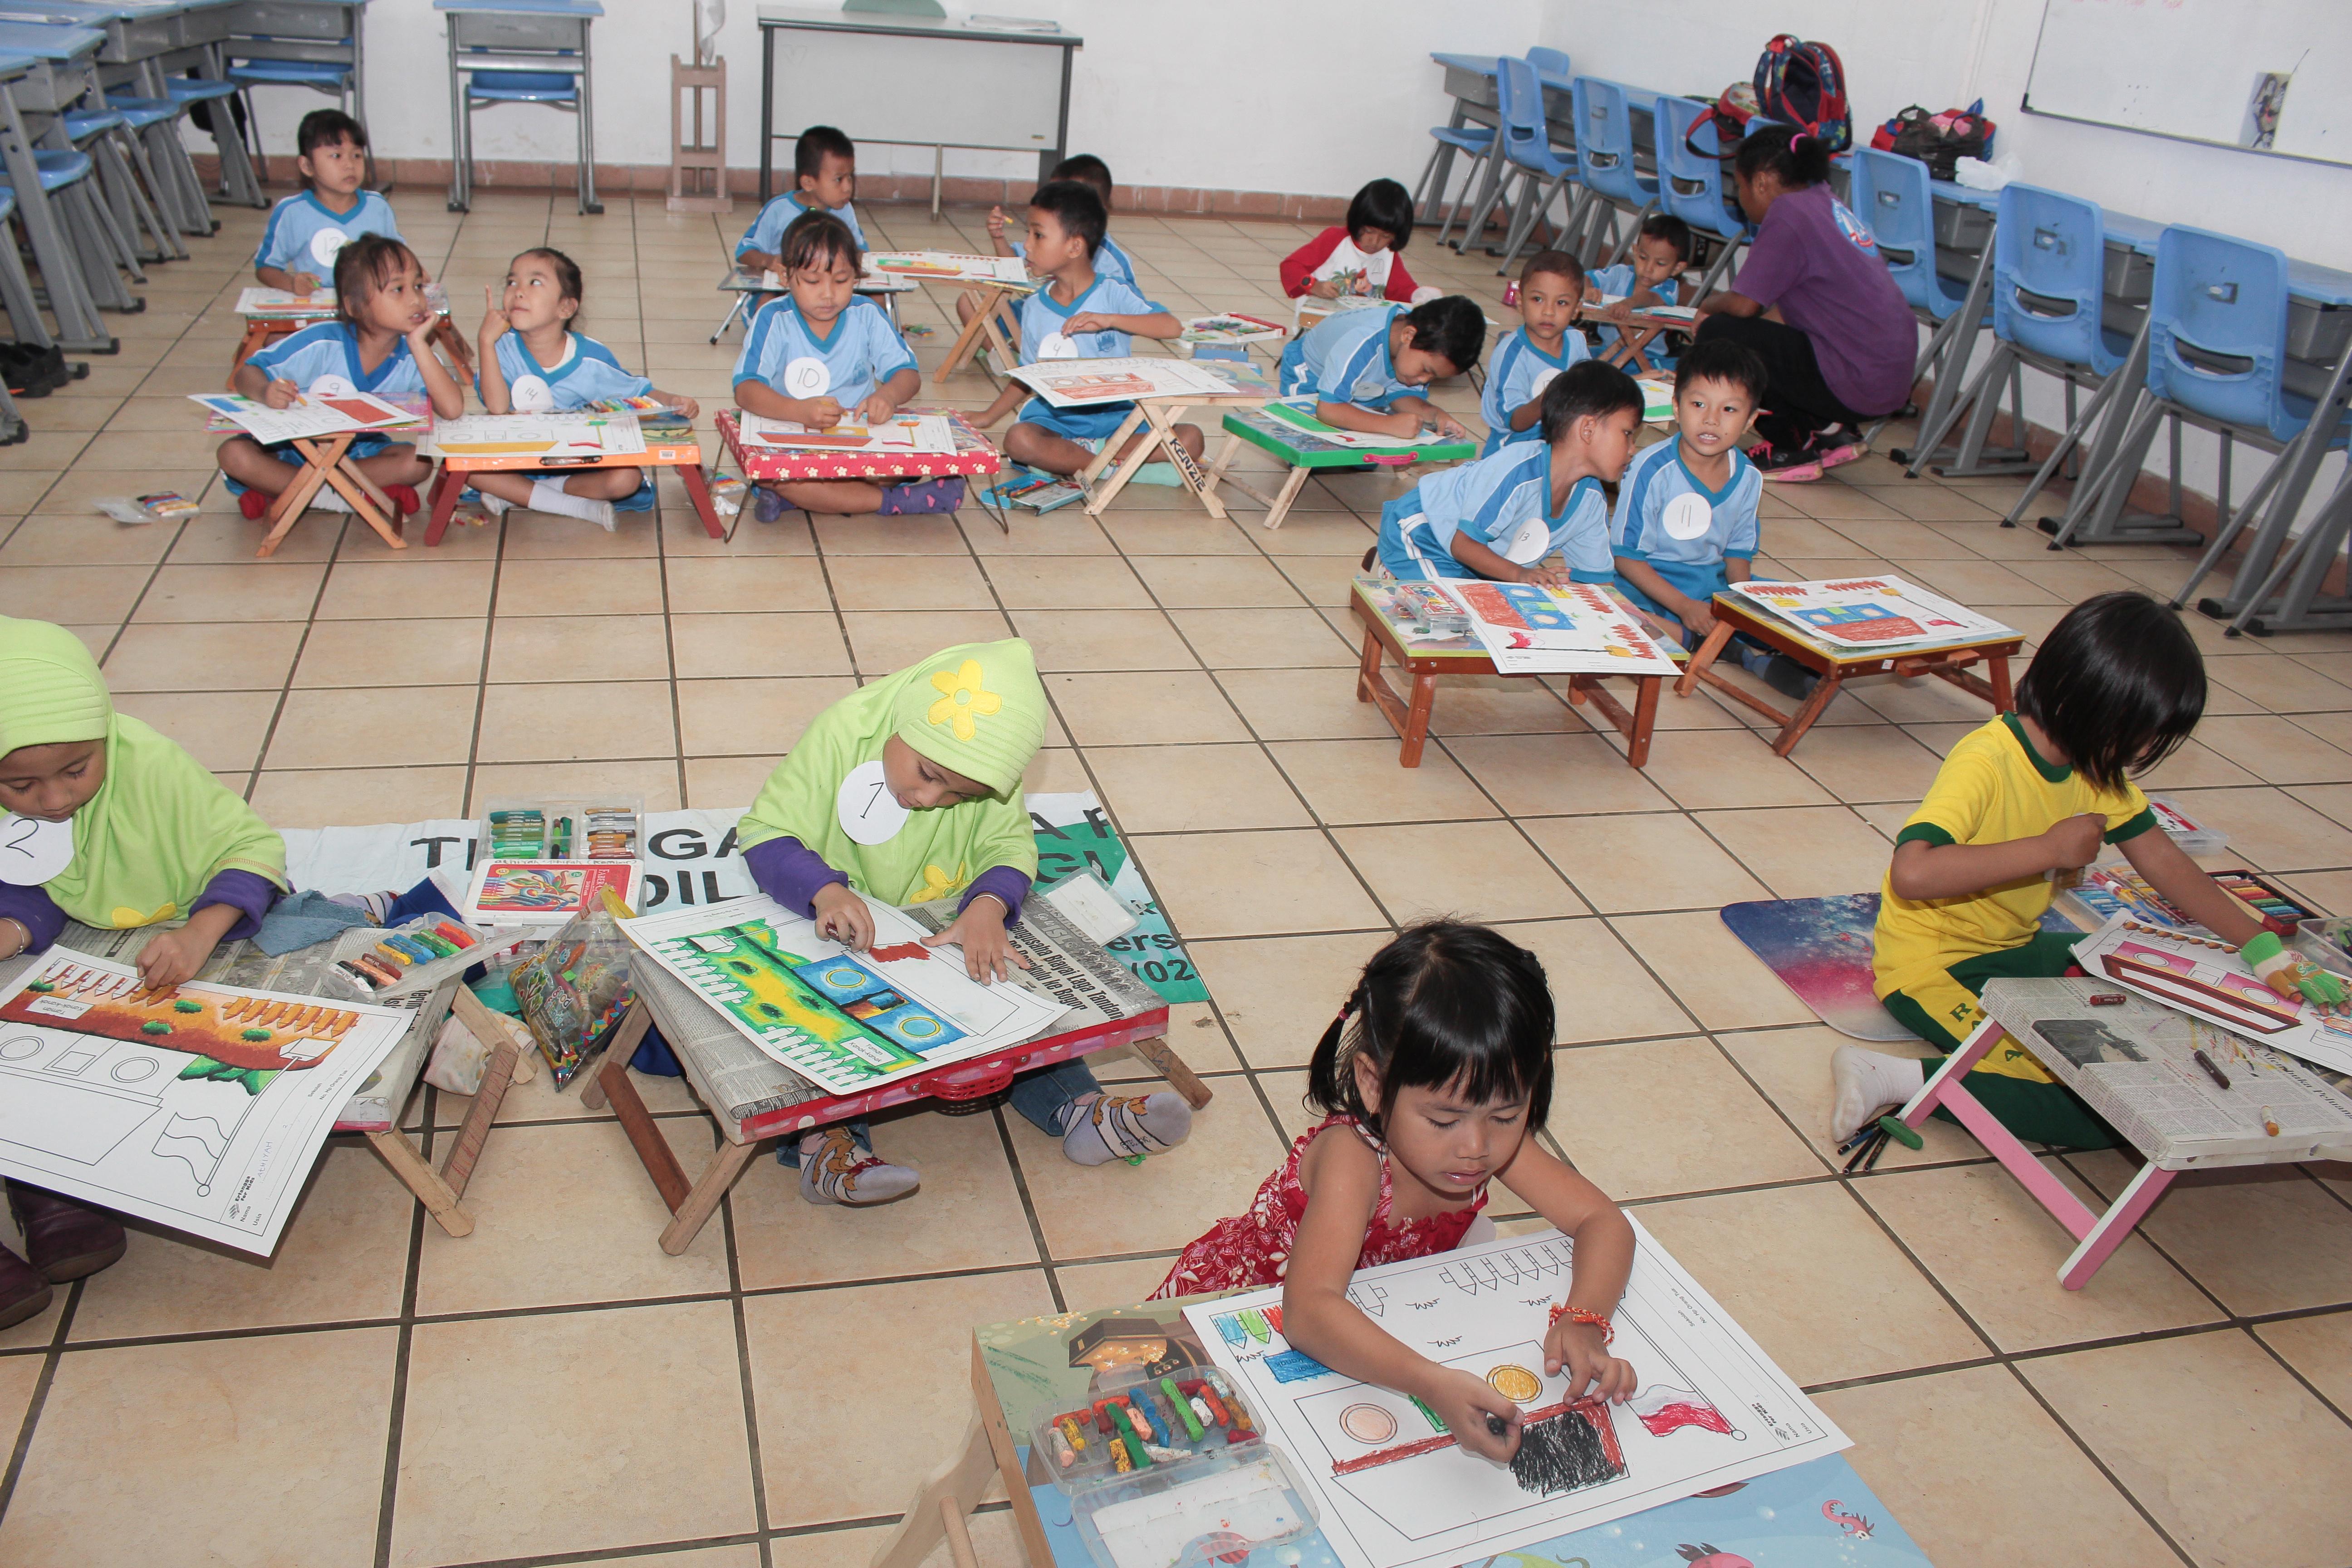 sekolah anak indoensia-sekolah Papua-lomba mewarnai-lomba menggambar_ sekolah papua di sentul-sekolah anak papua-sekolah hebat